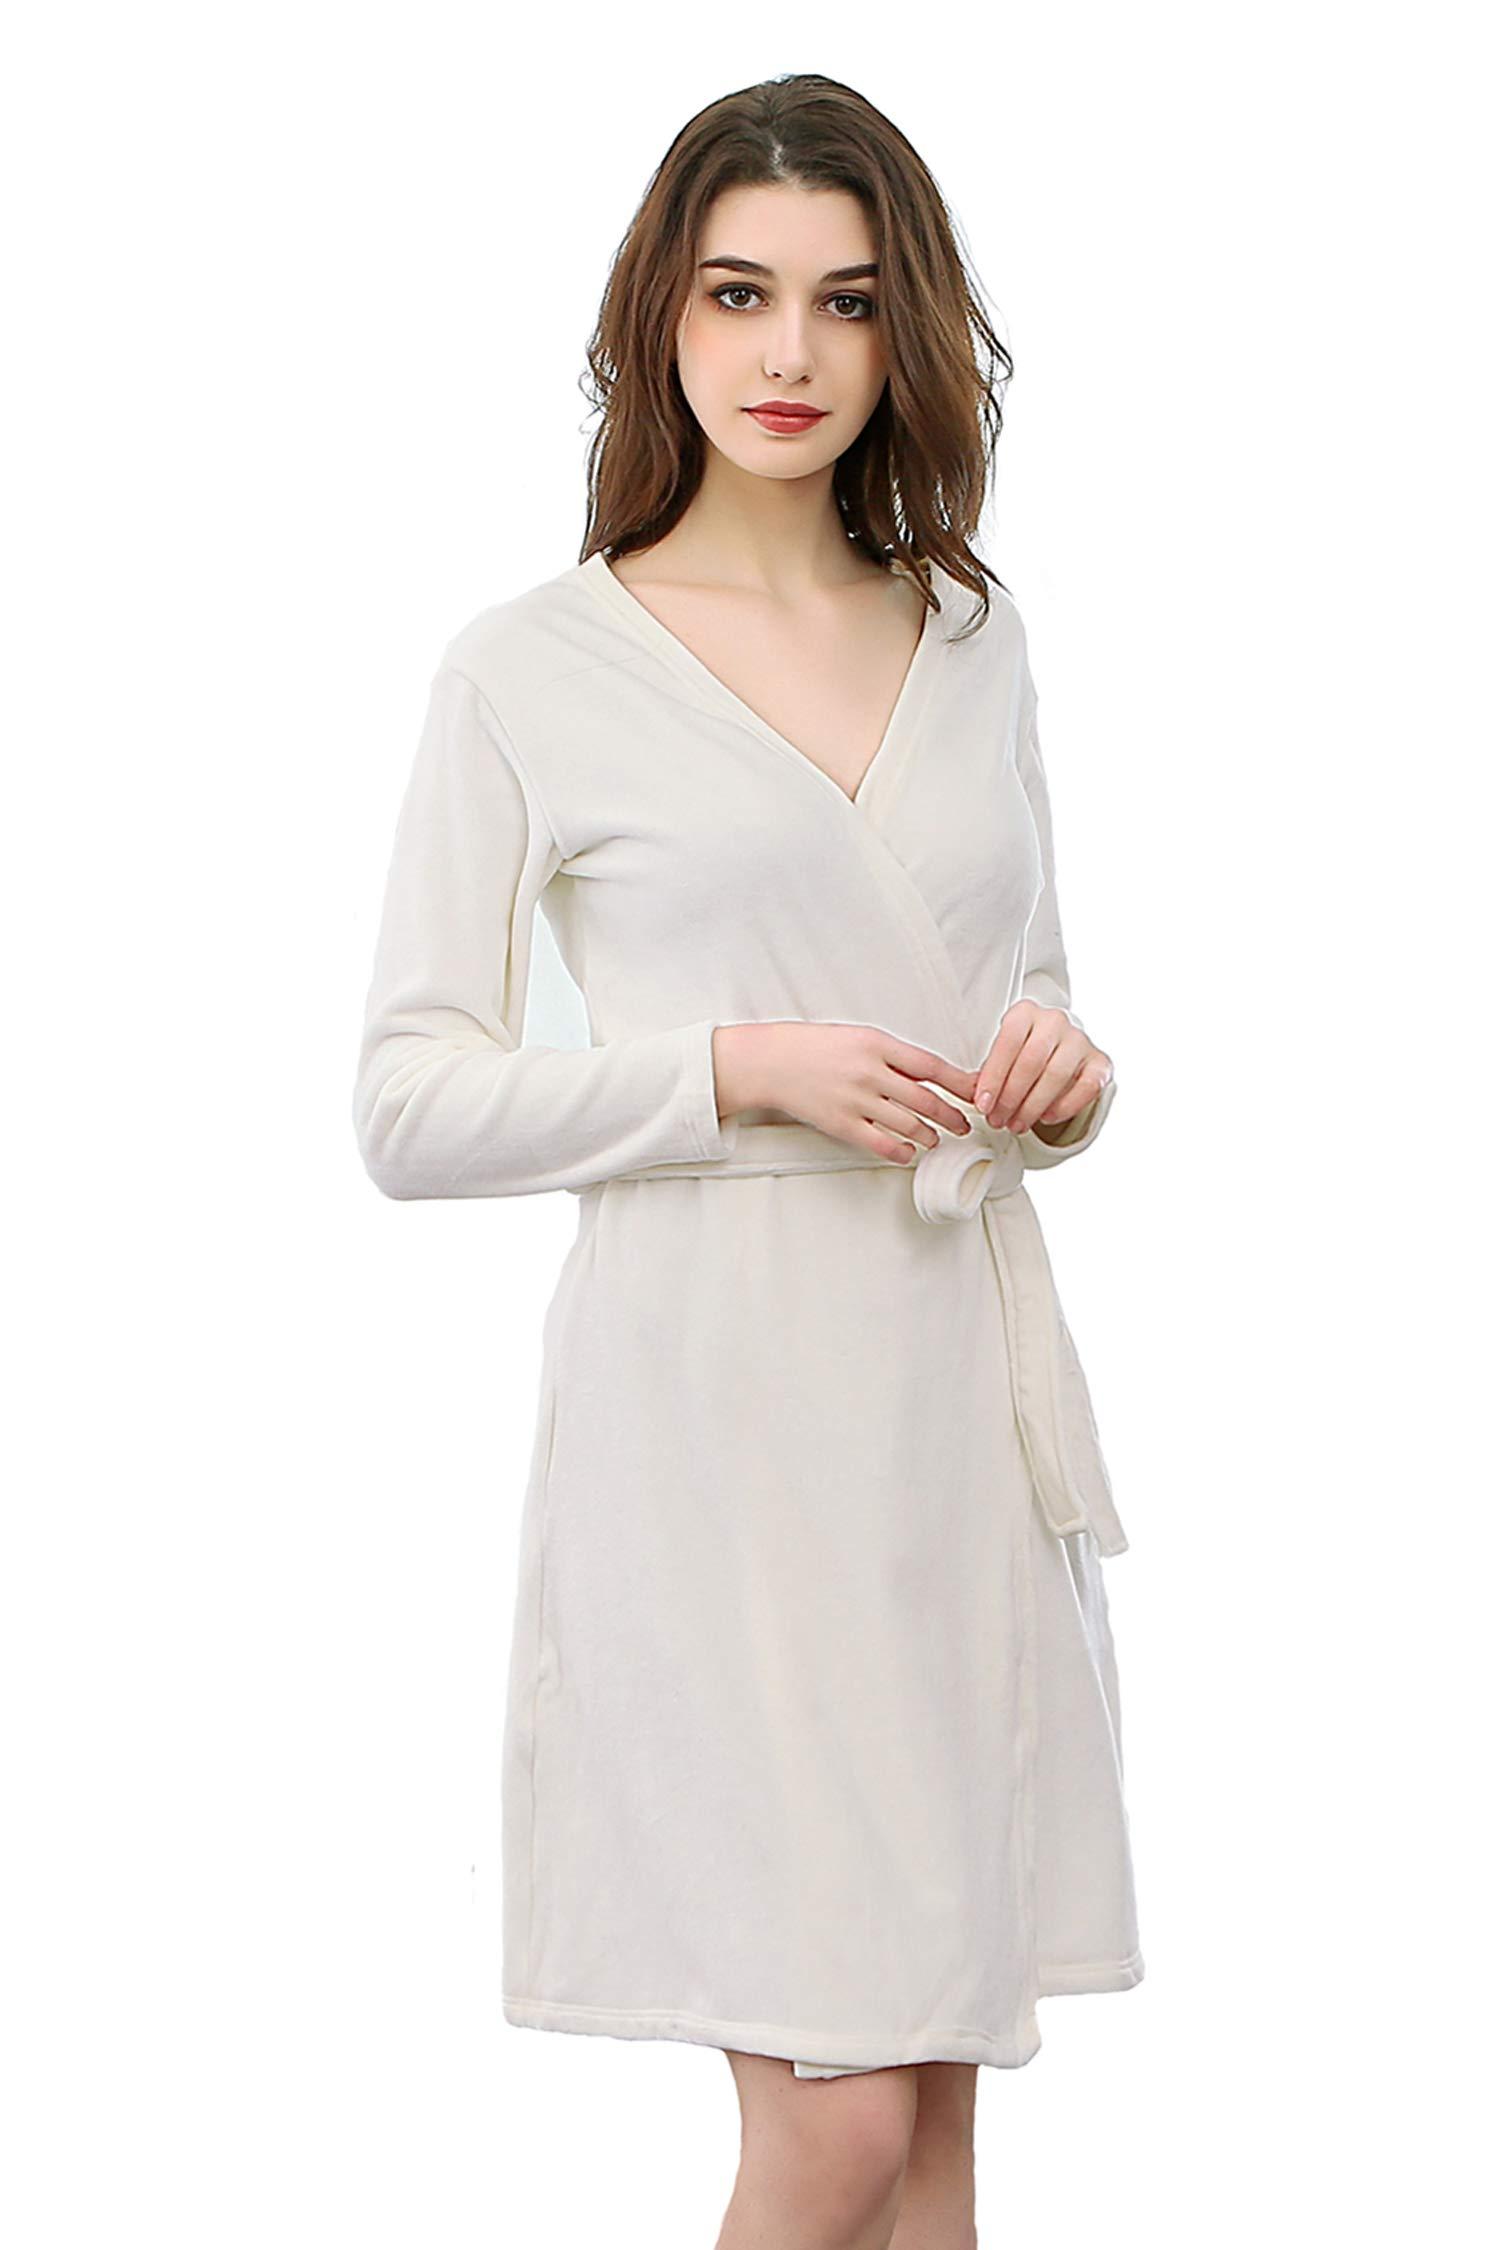 Cahayi Super Soft Women Bathrobe Lightweight Spa Hotel Robe Kimono Nightgown